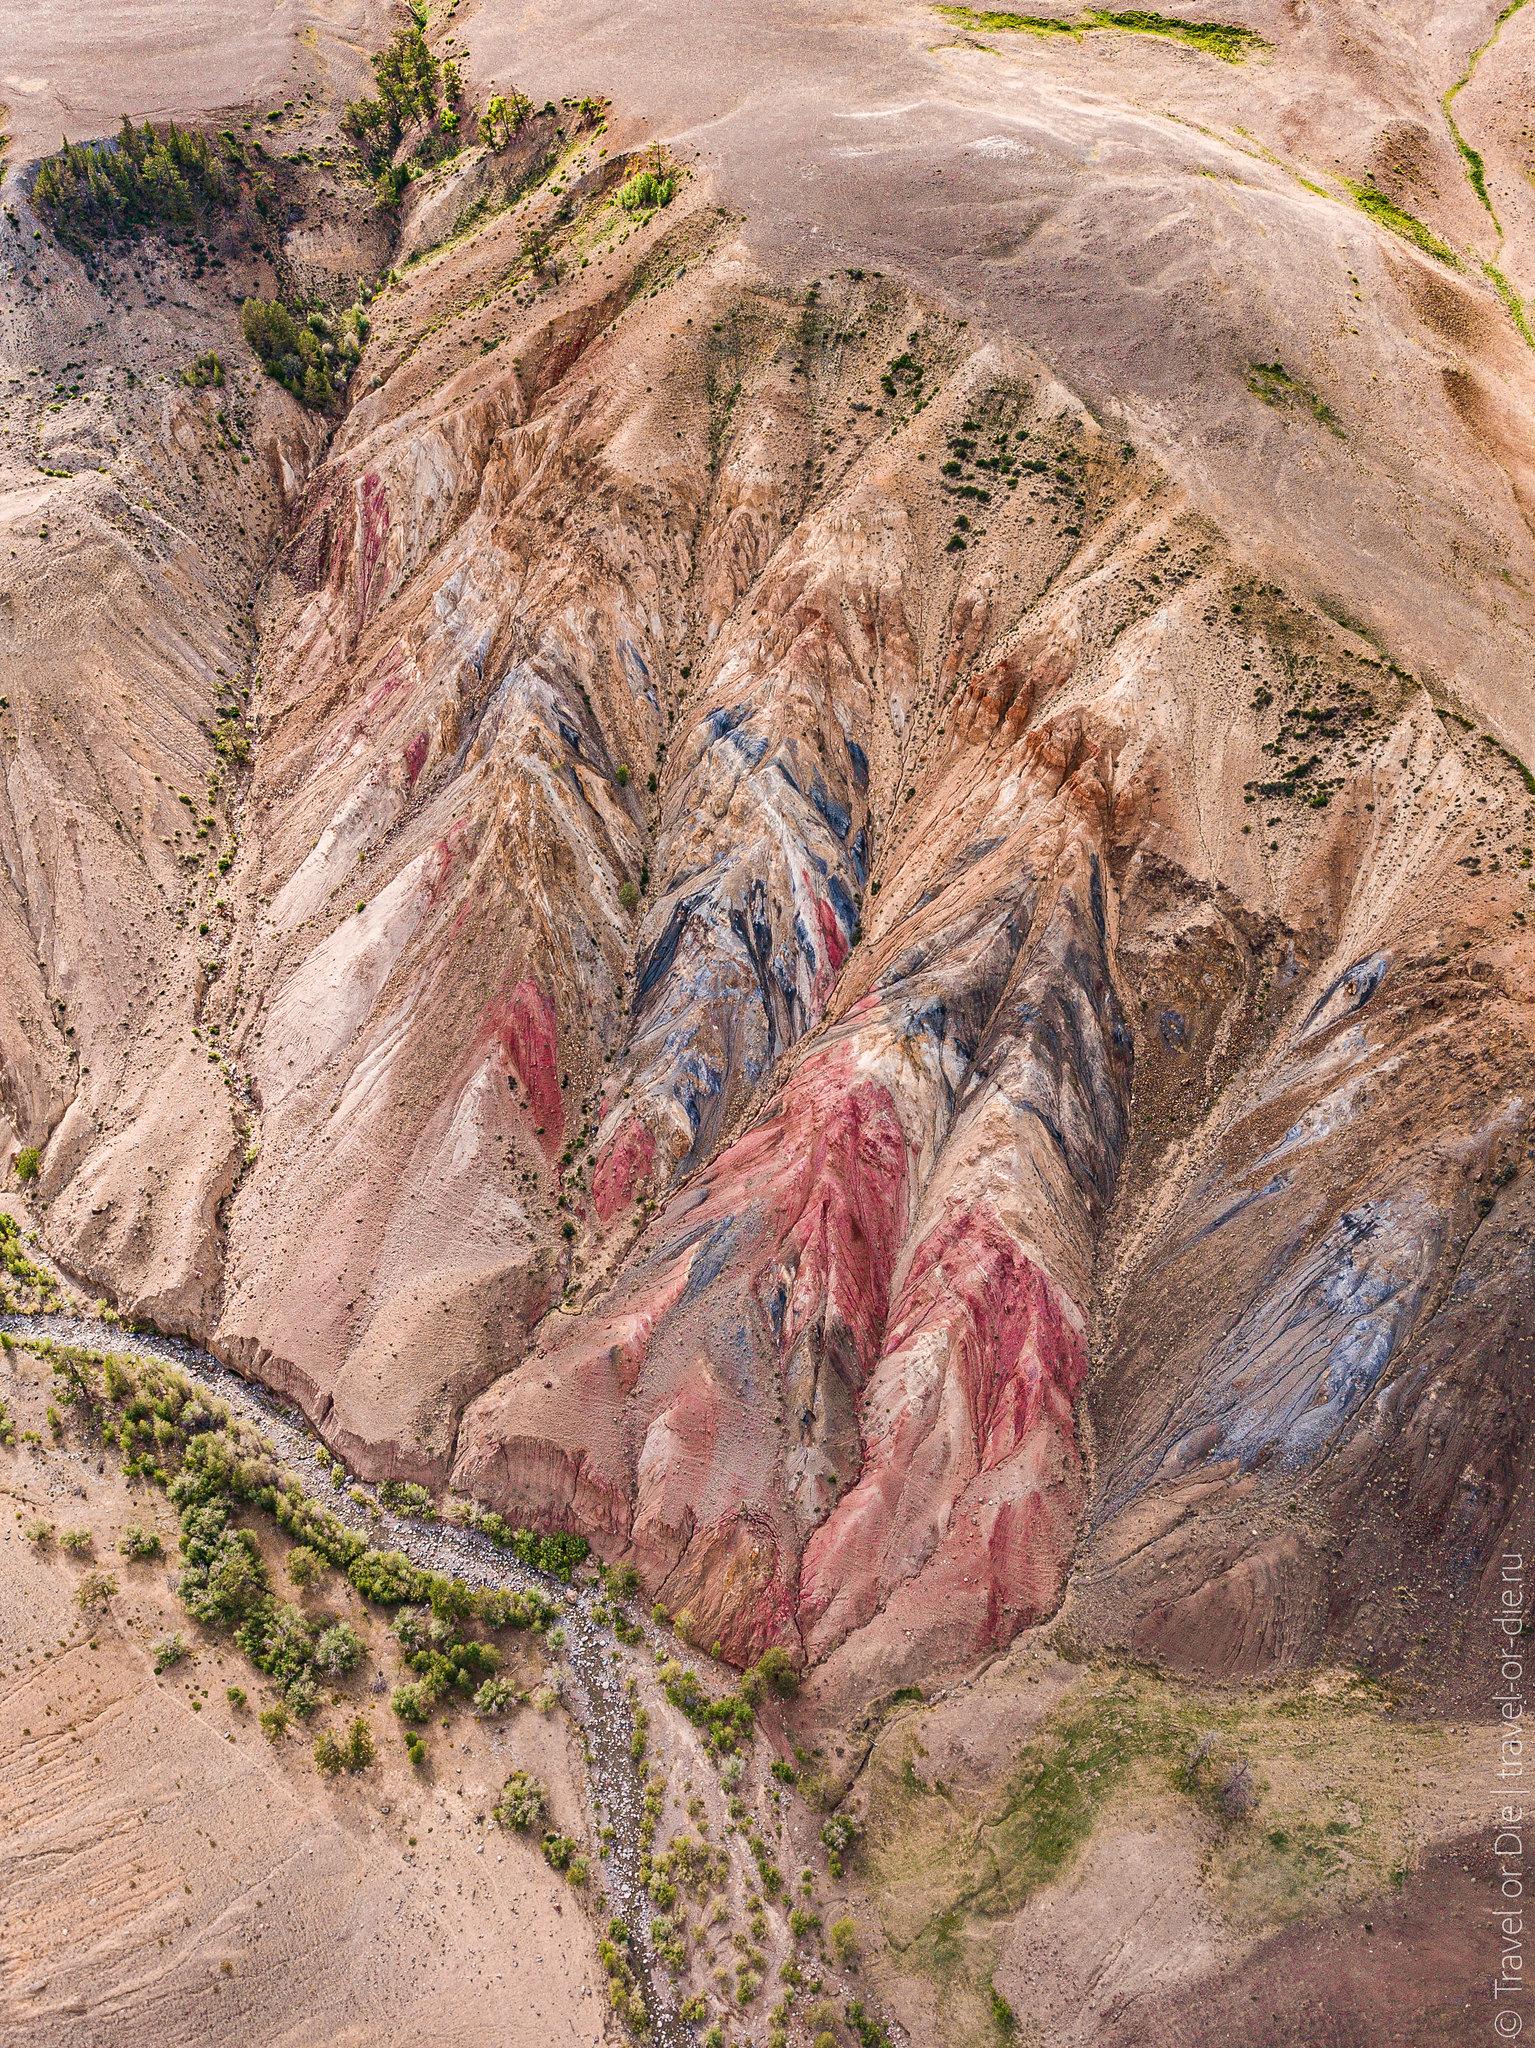 Mars-Kyzyl-Chin-Valley-Altay-dji-mavic-0394